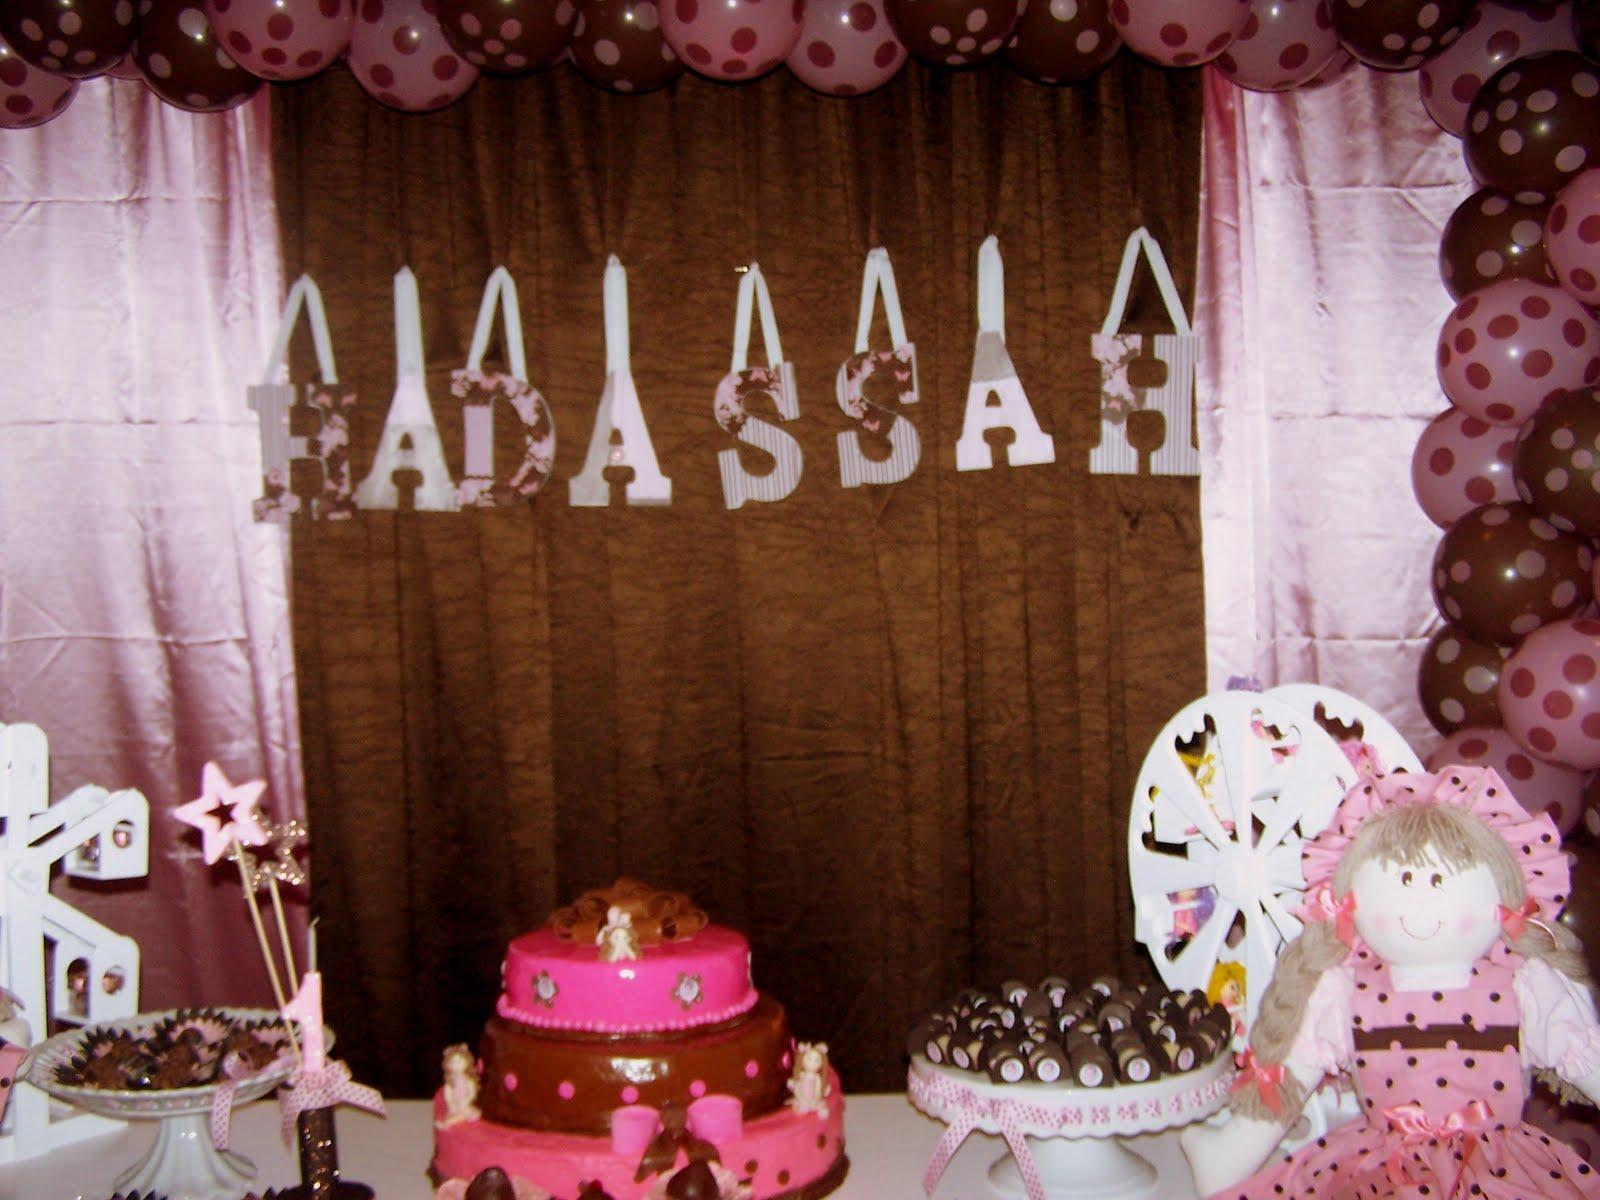 Pink Balloon Decorations